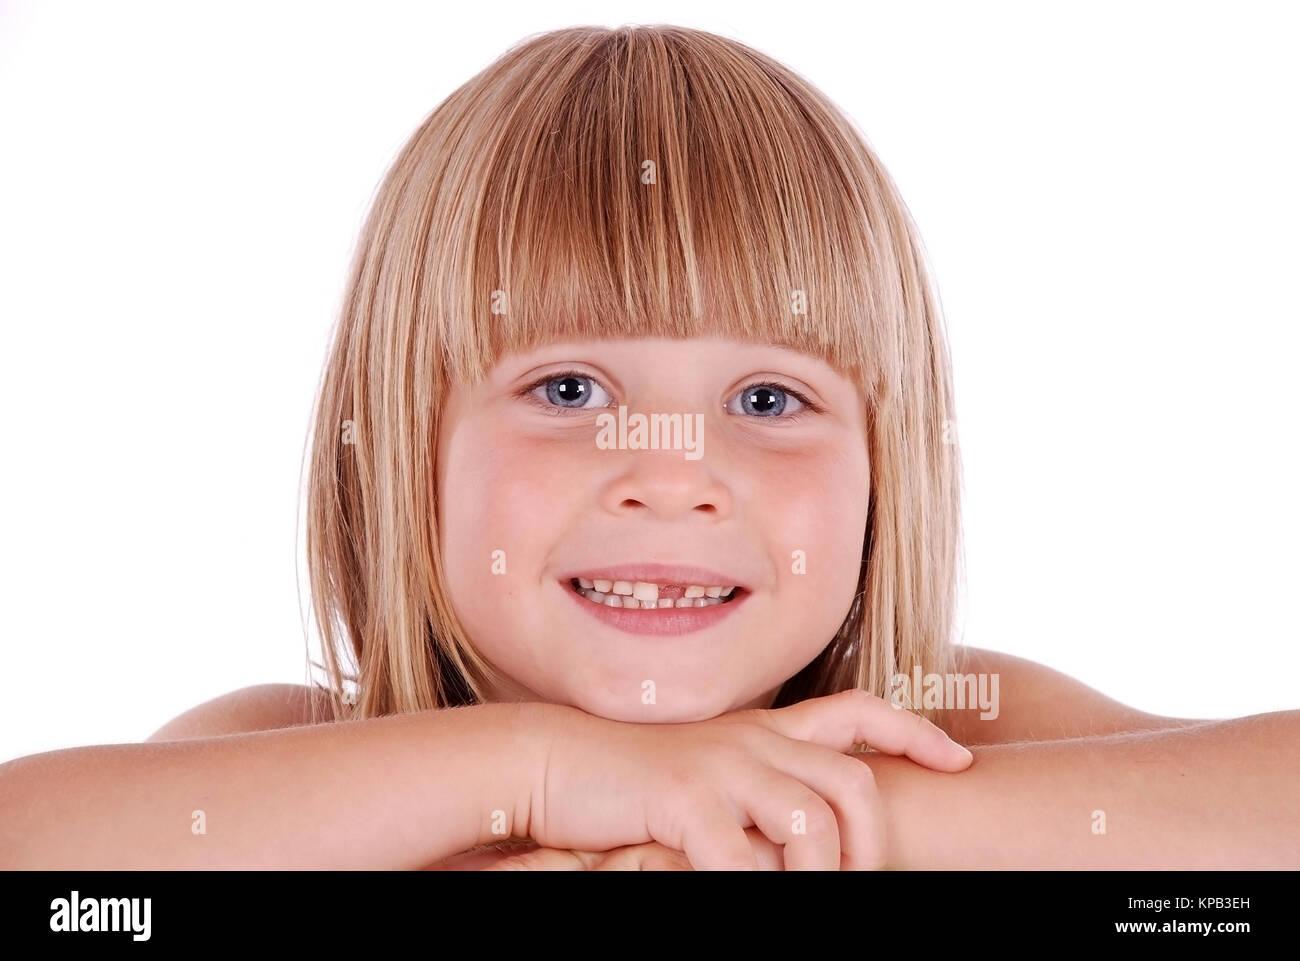 gap in teeth stock photos gap in teeth stock images alamy. Black Bedroom Furniture Sets. Home Design Ideas